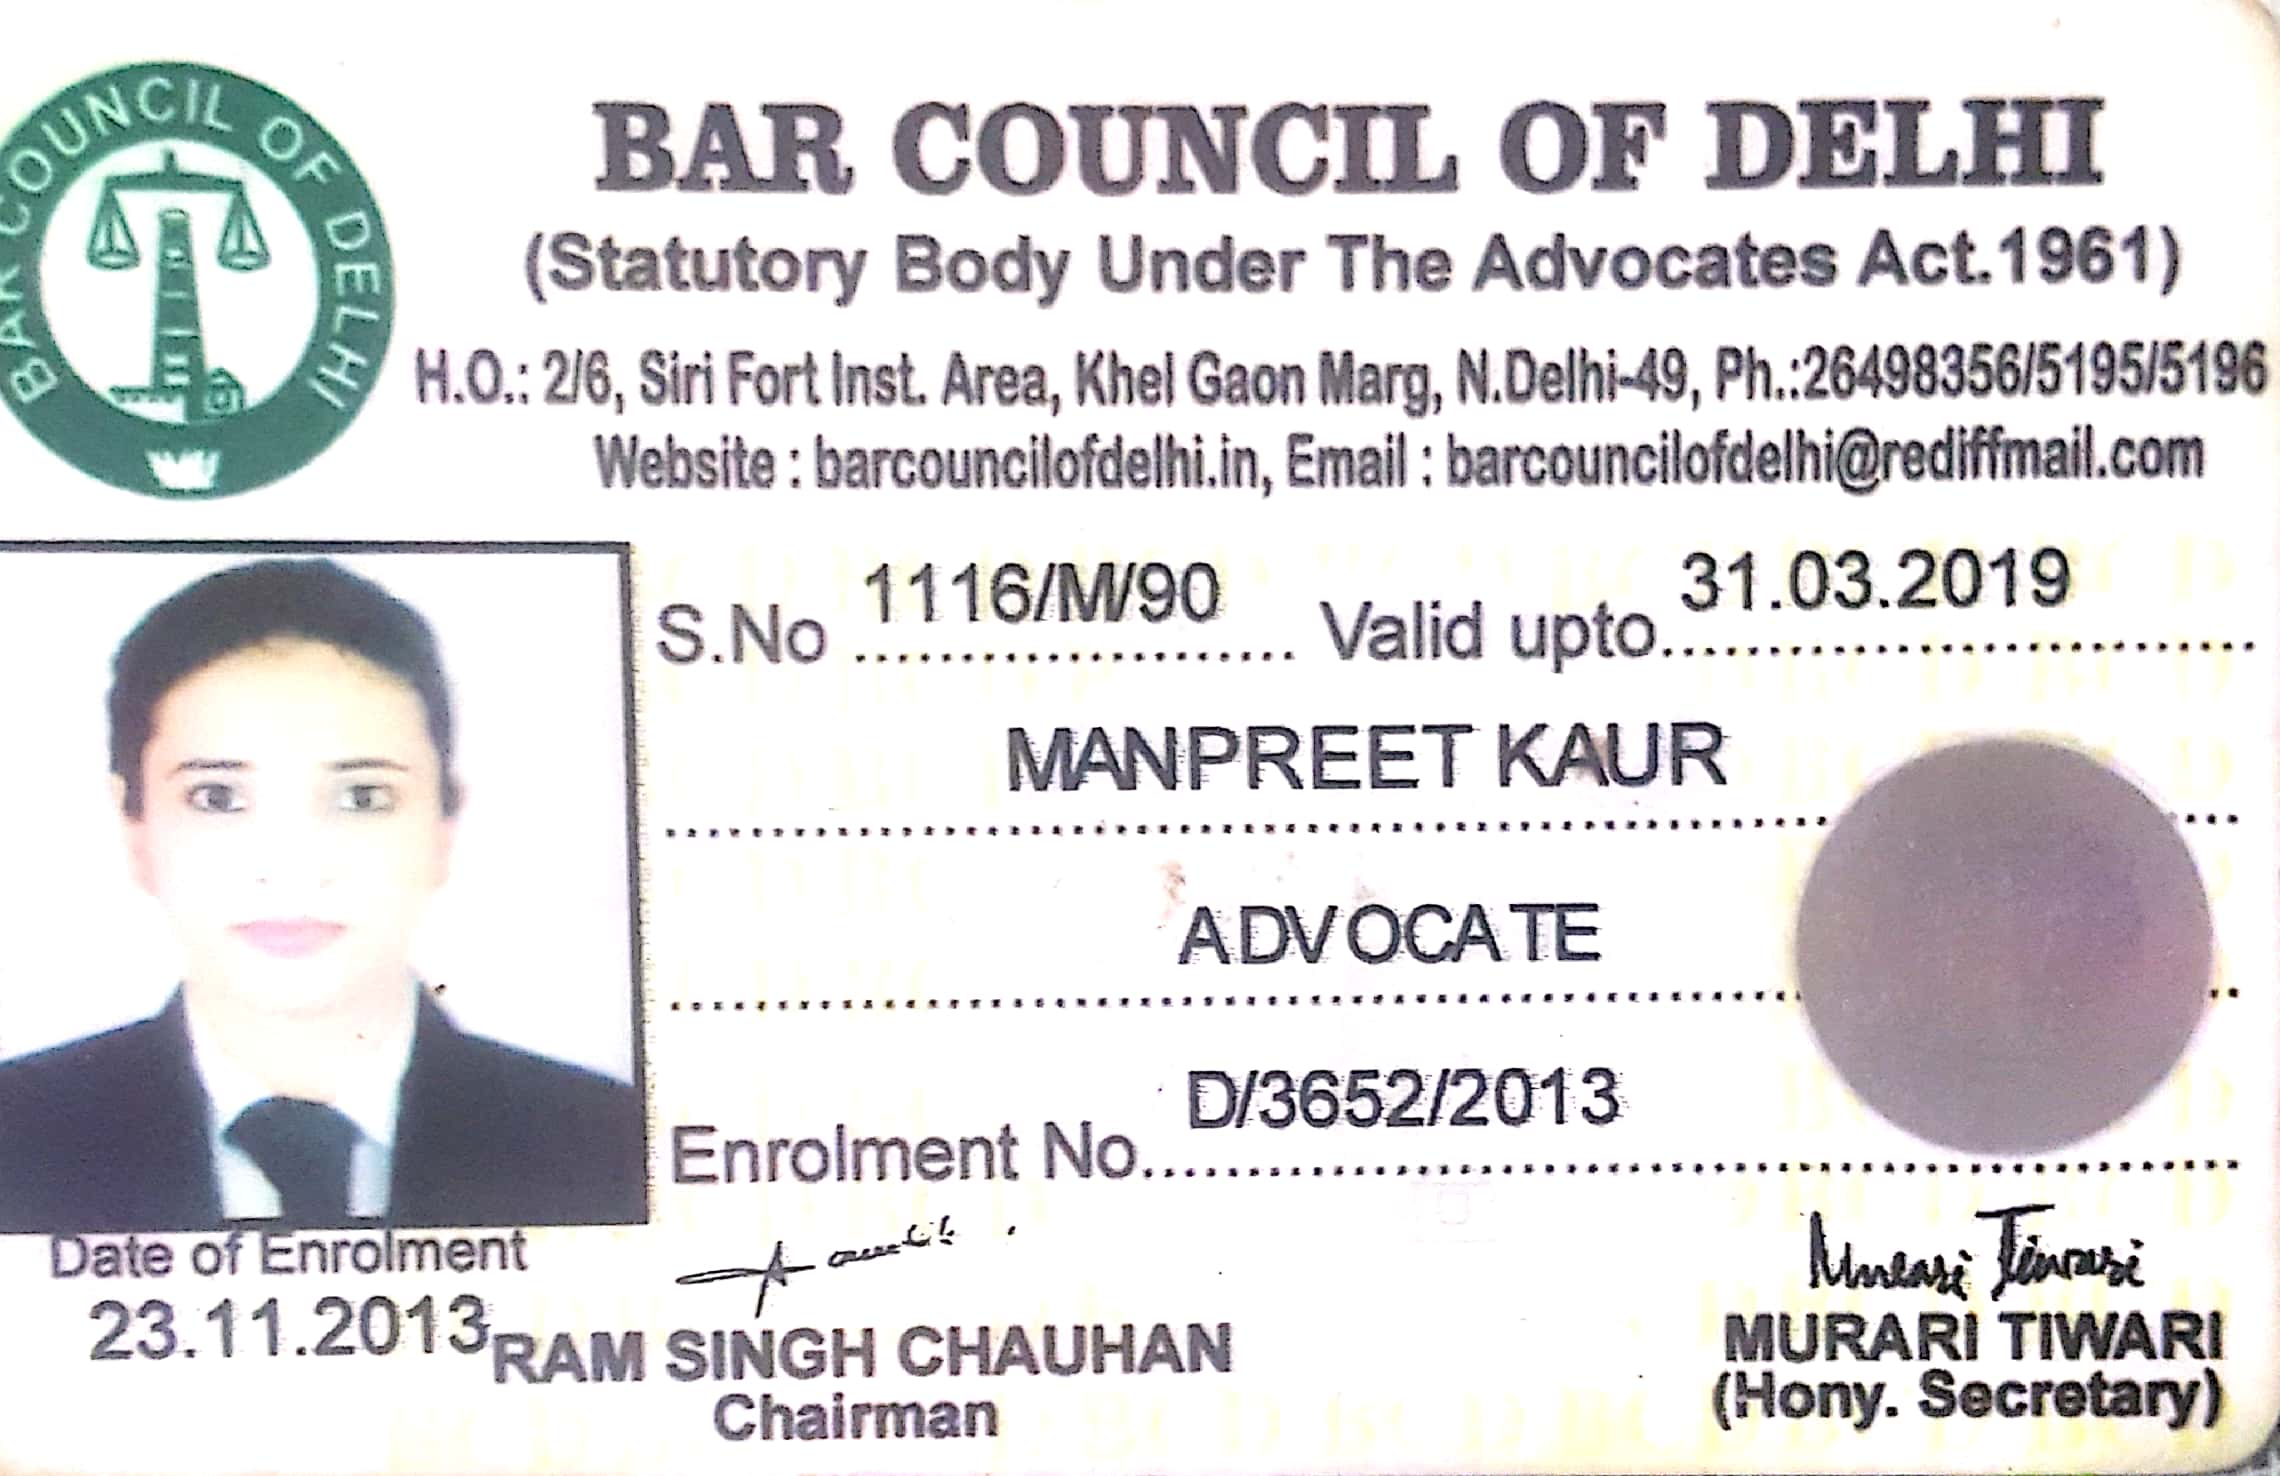 Advocate MANPREET  KAUR